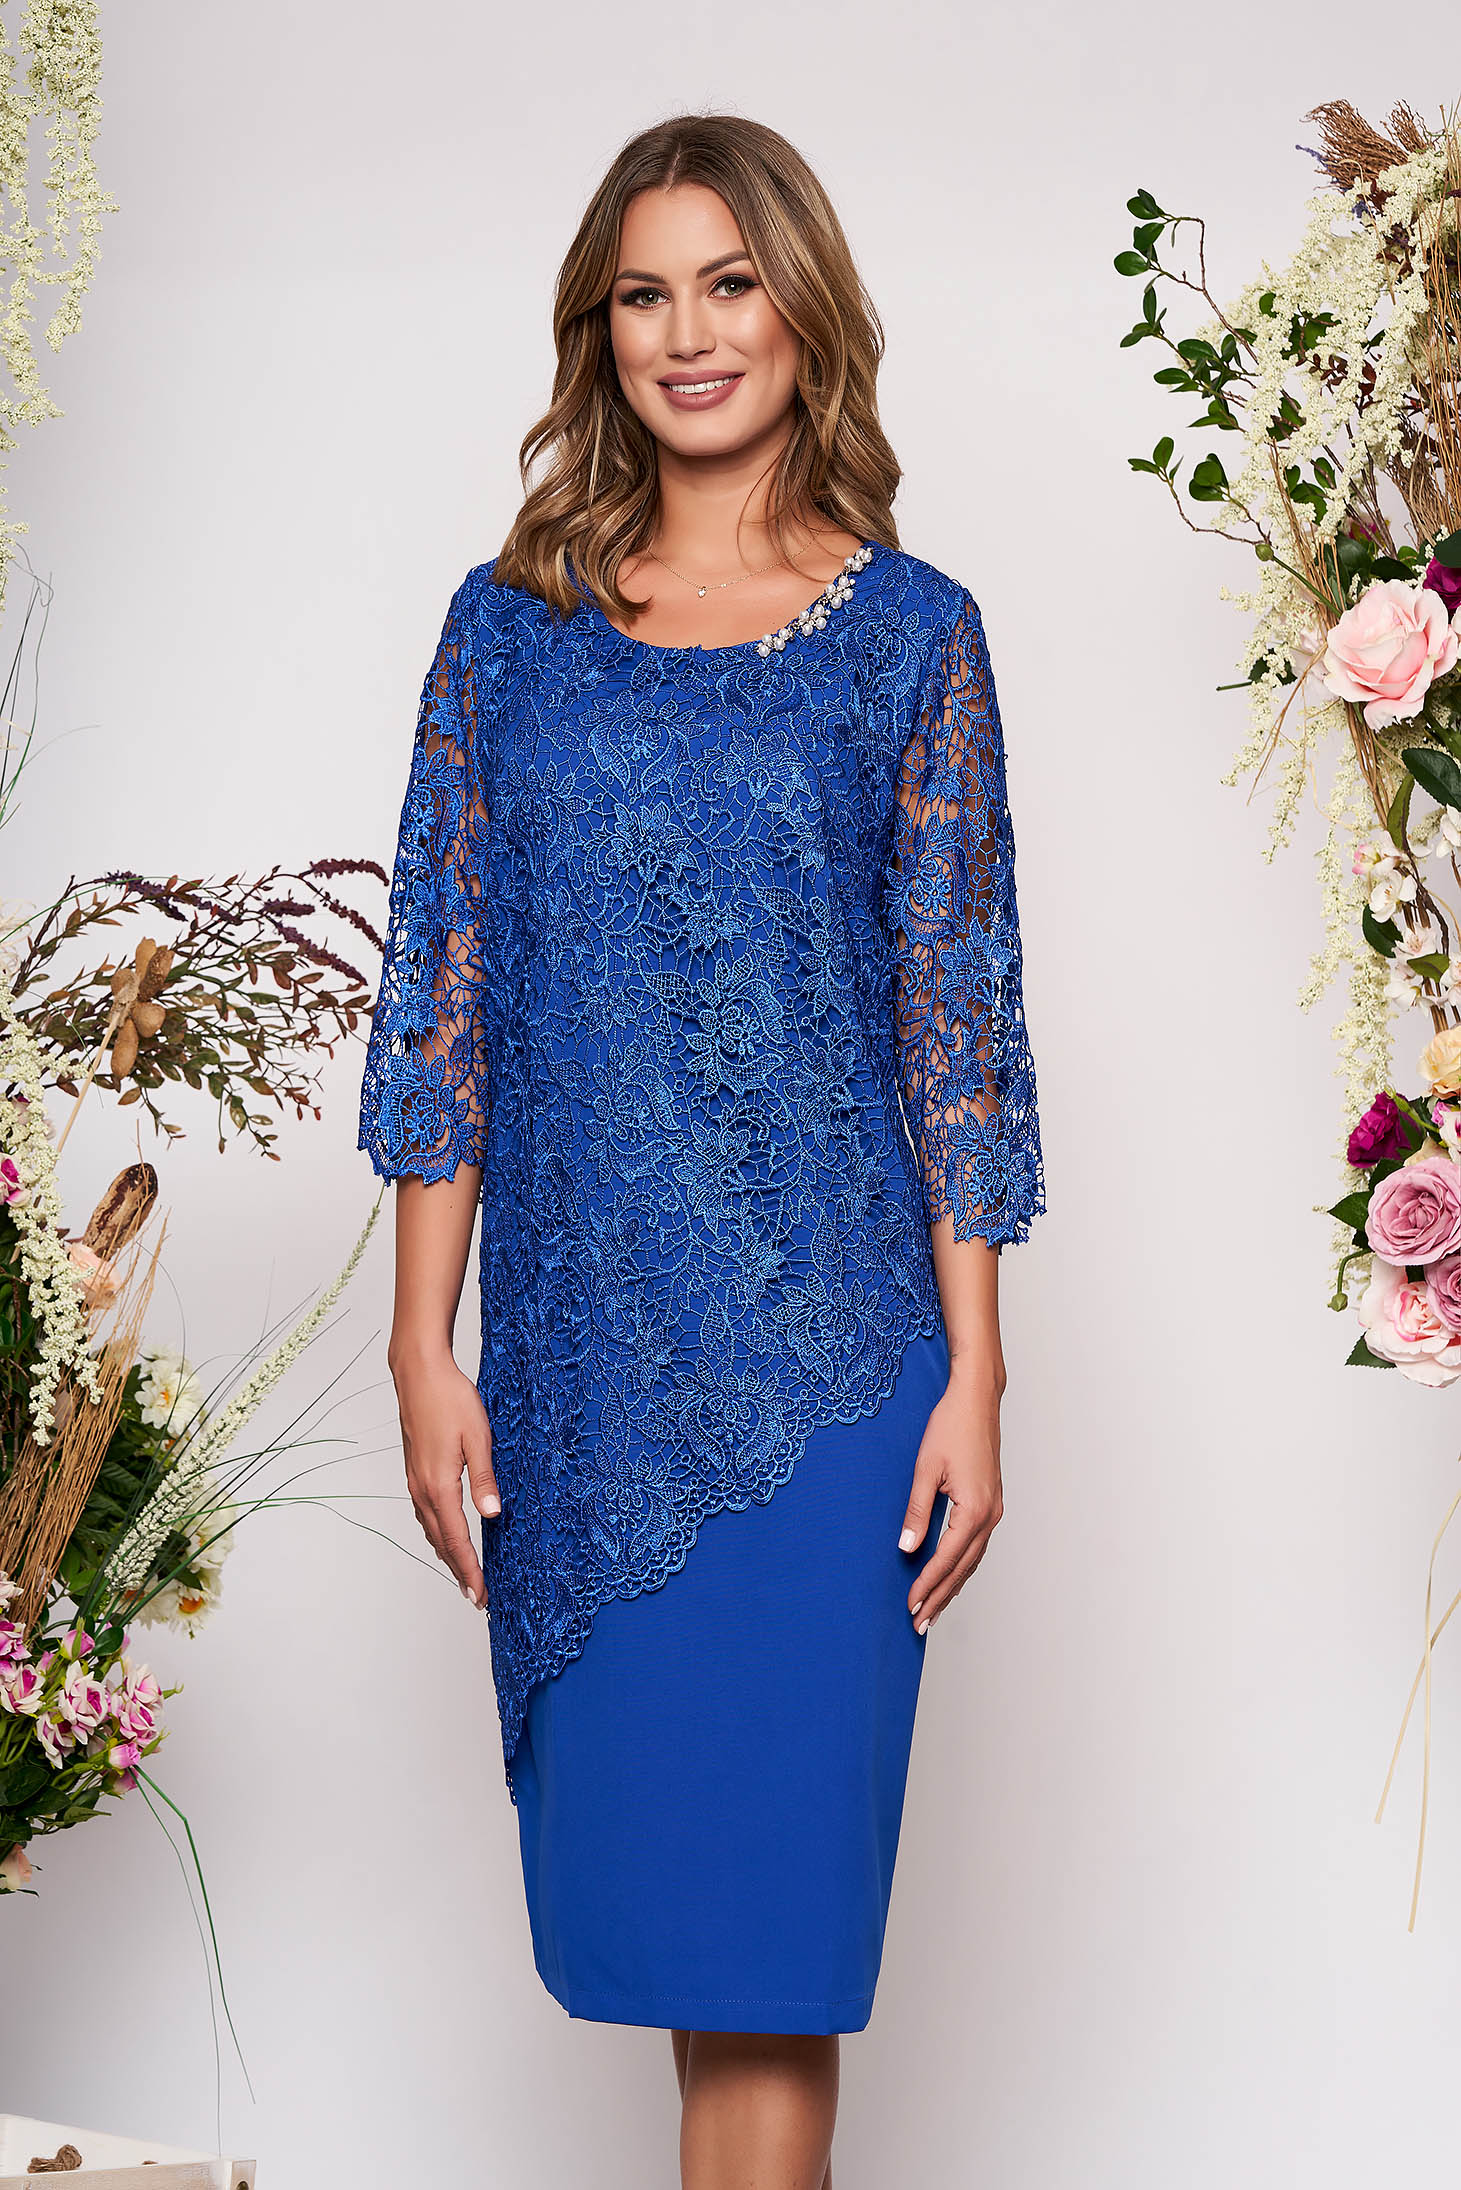 Rochie albastra midi de ocazie cu un croi mulat din stofa usor elastica cu maneci trei sferturi si suprapunere cu dantela